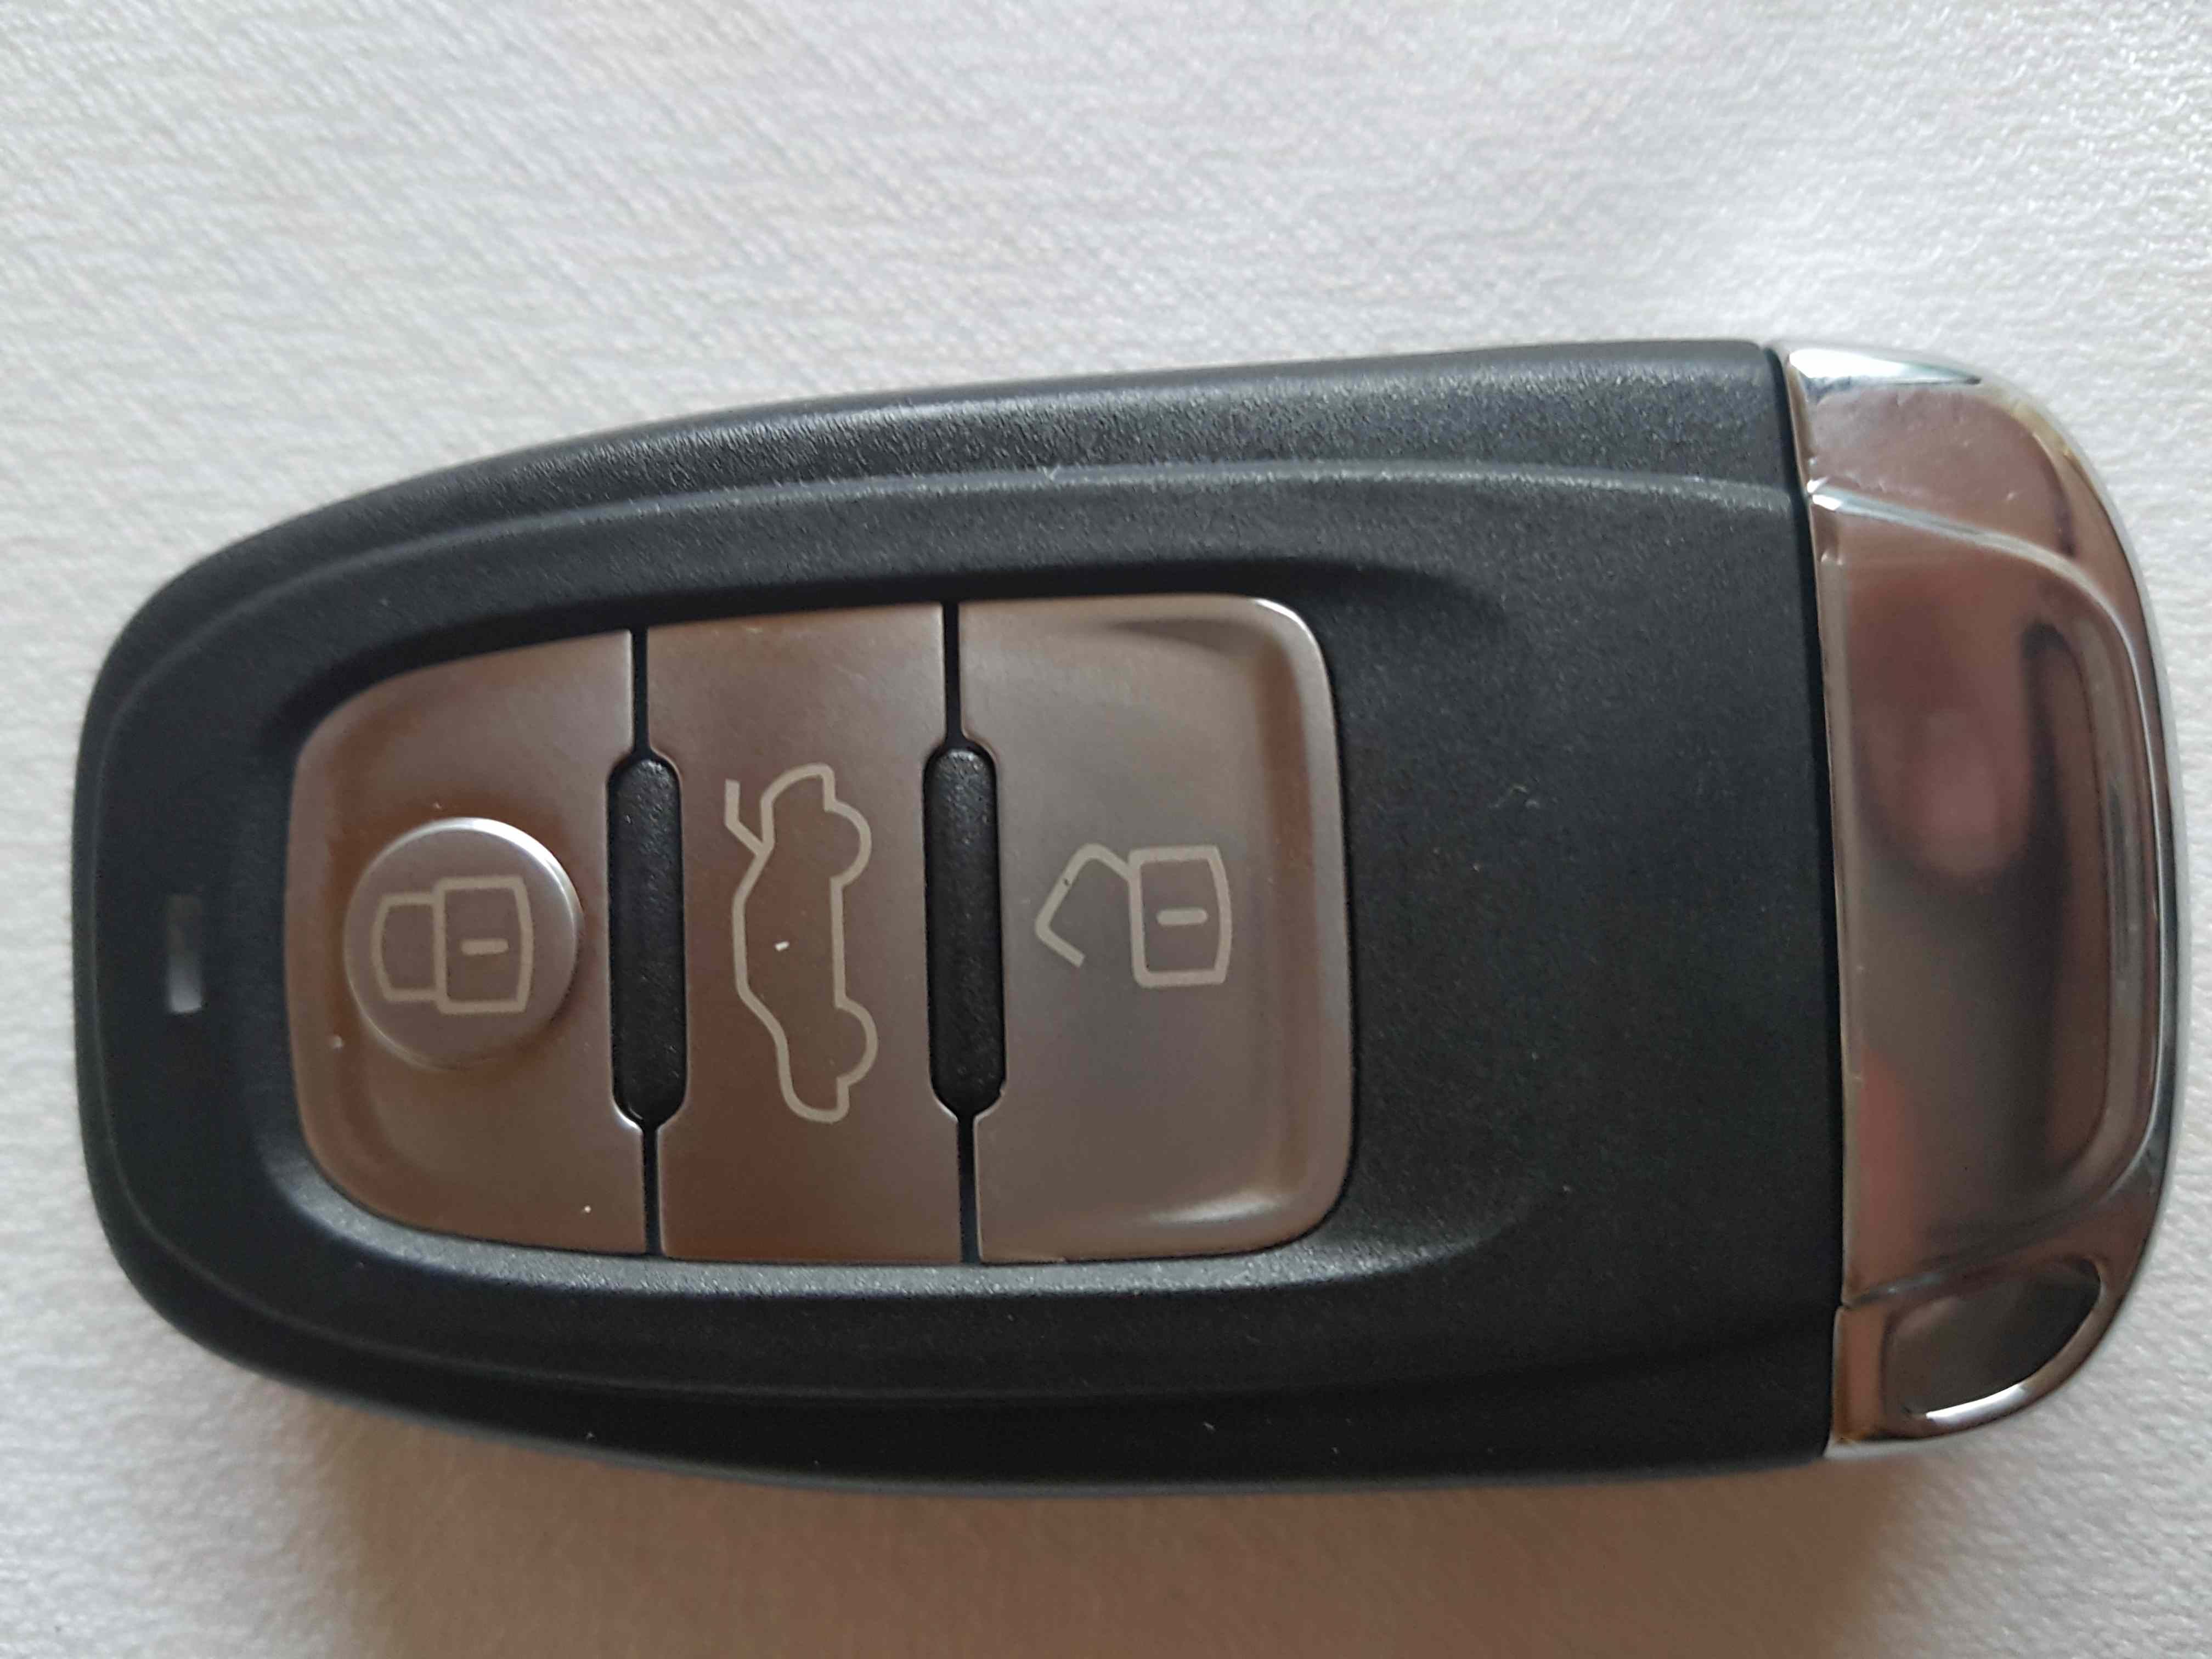 audi-a5-ersatzschluessel